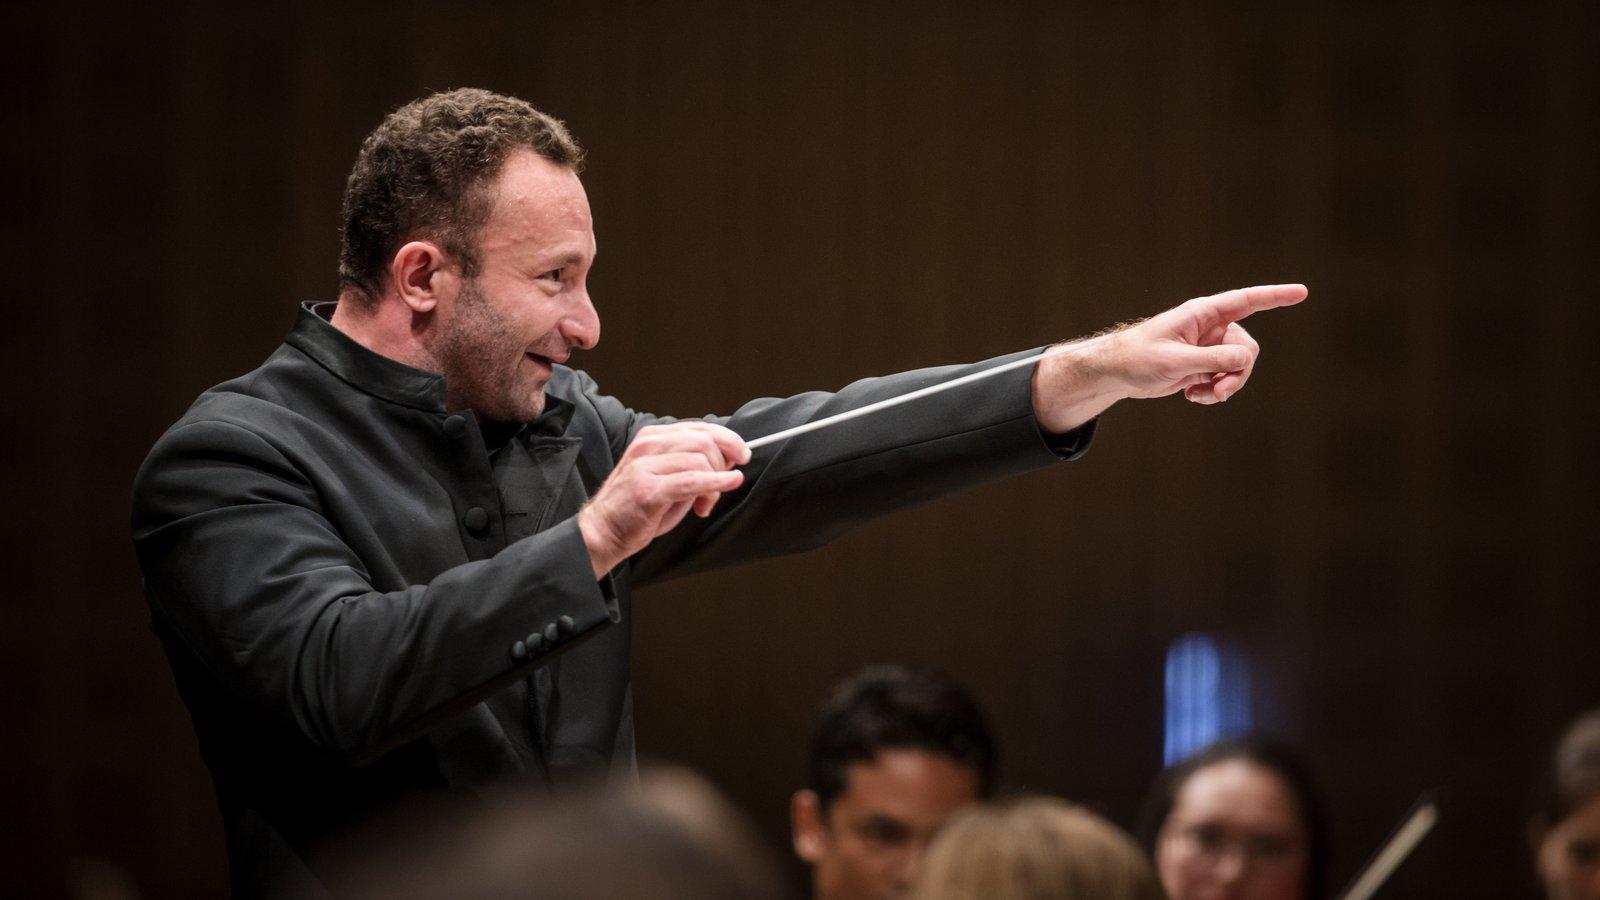 Lucerne Festival   30 08 2018 Berlin Philharmonic   Kirill Petrenko